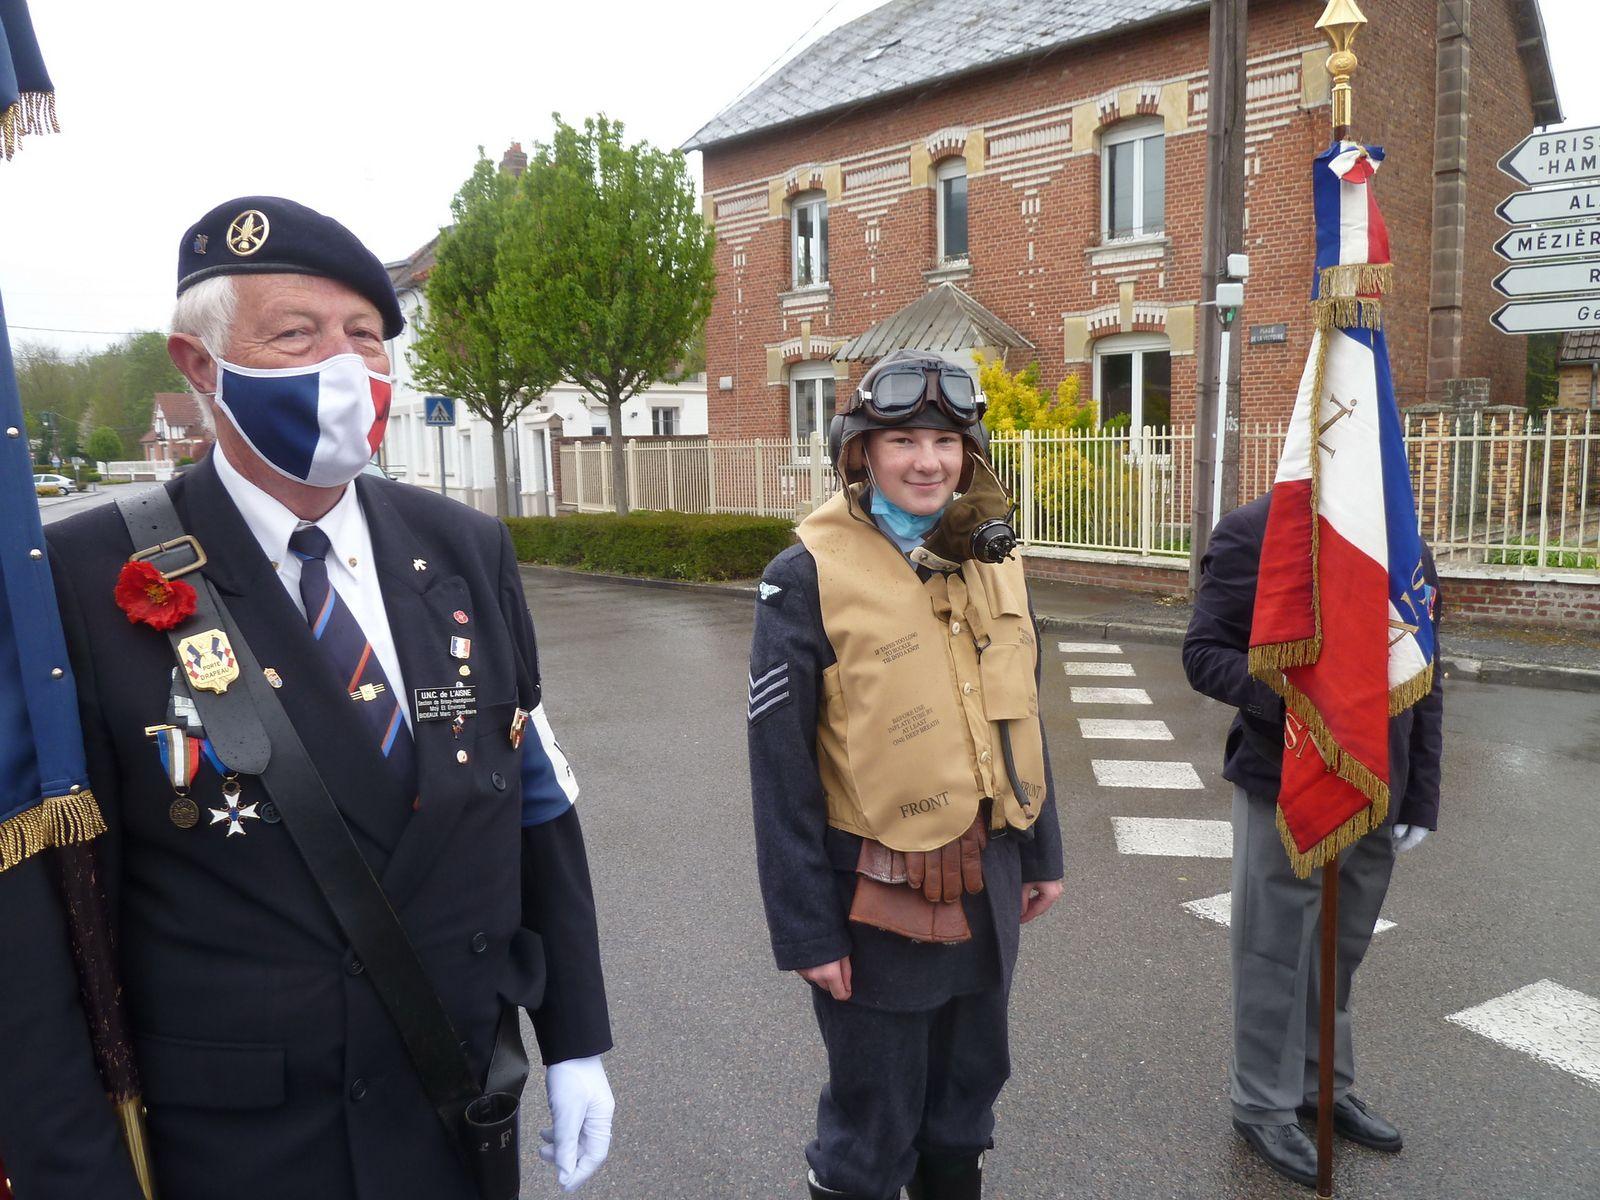 08 MAI 1945 : FIN DE LA GUERRE EN EUROPE Moy-De-L'Aisne